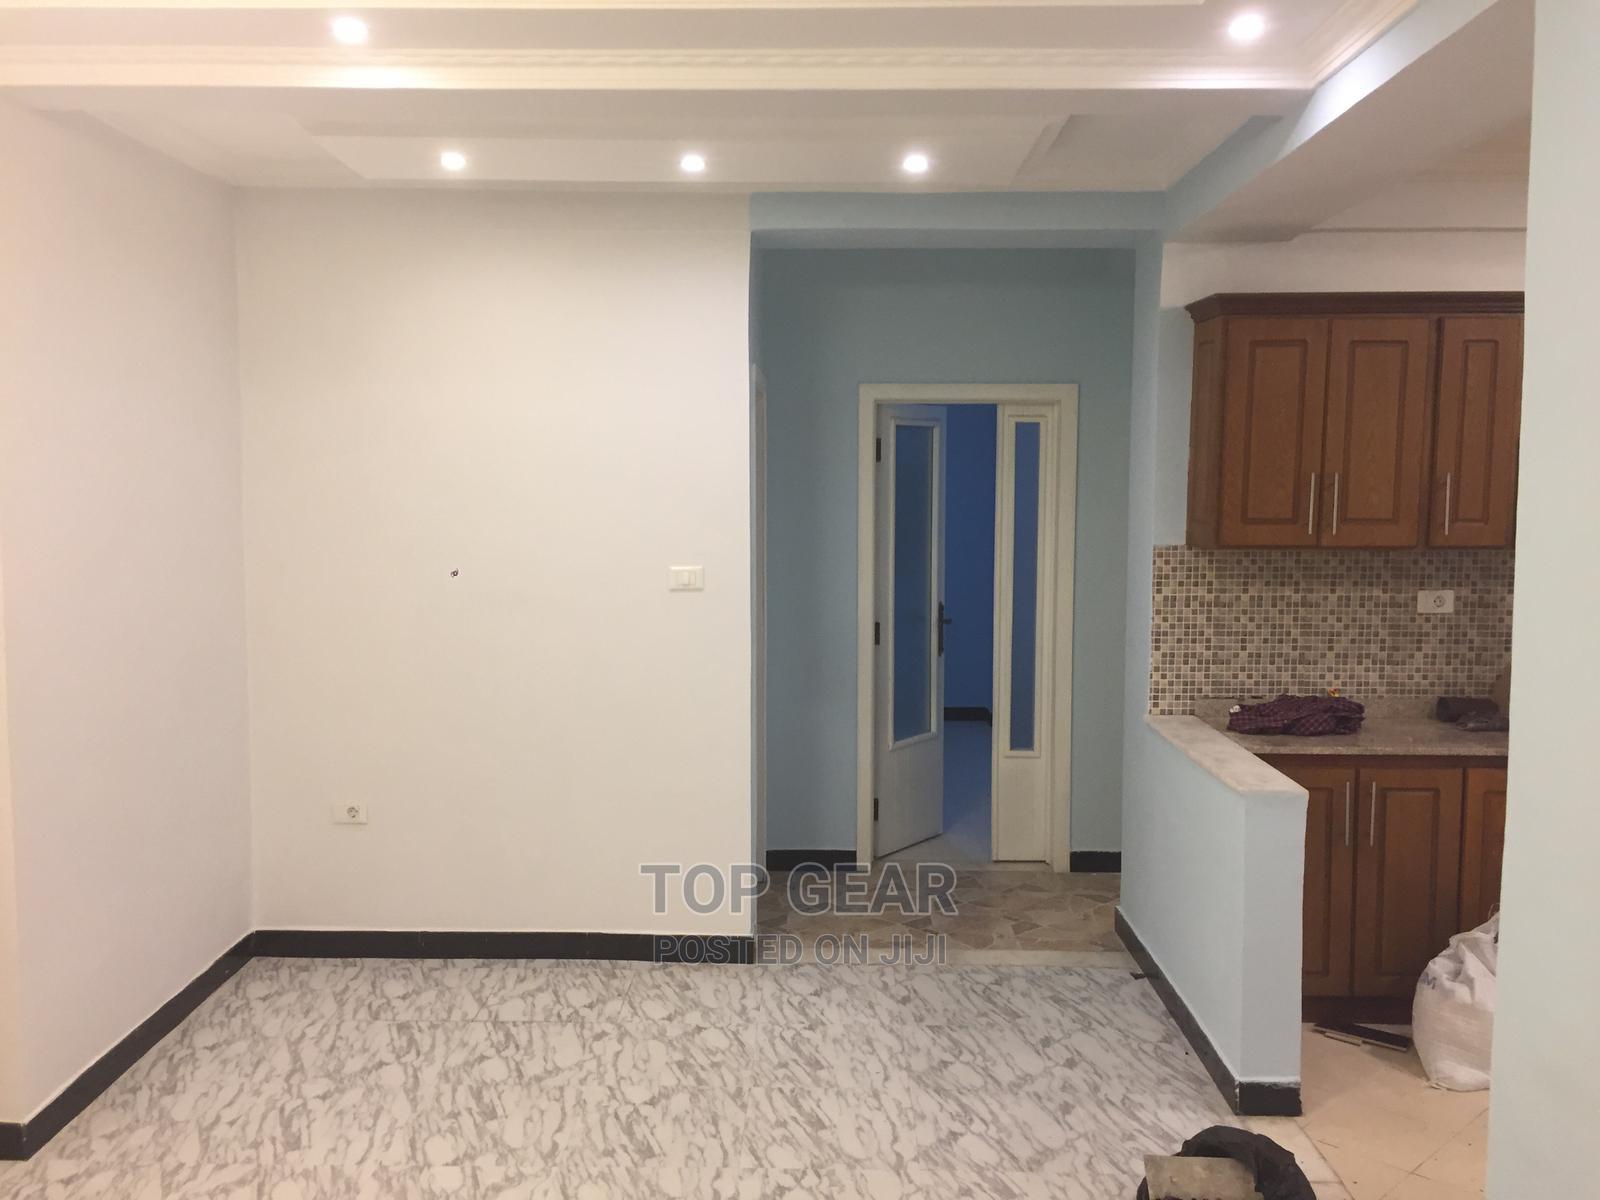 3bdrm Apartment in Summit, Bole for Sale